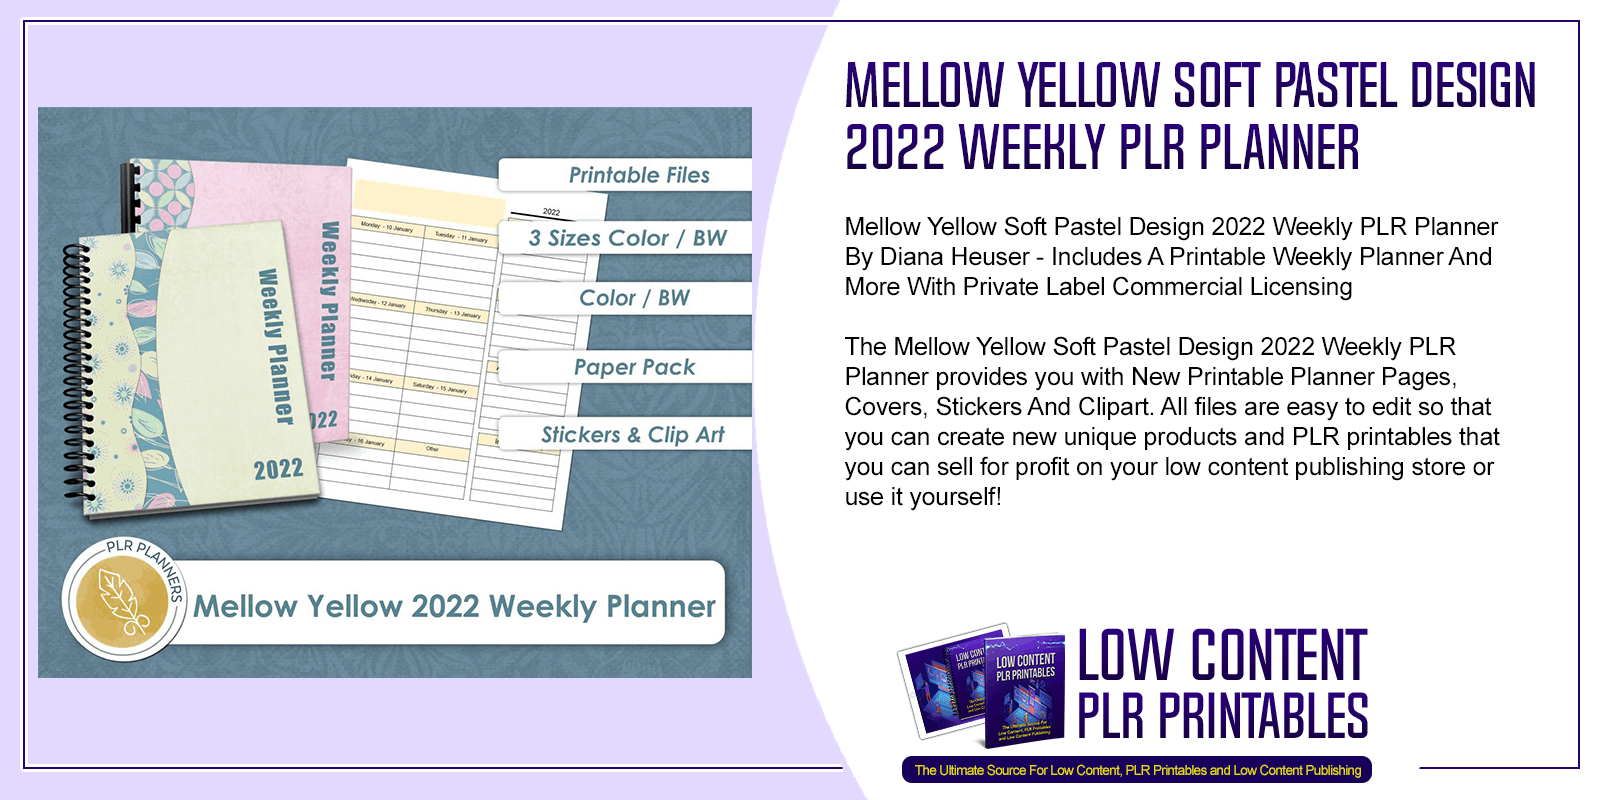 Mellow Yellow Soft Pastel Design 2022 Weekly PLR Planner